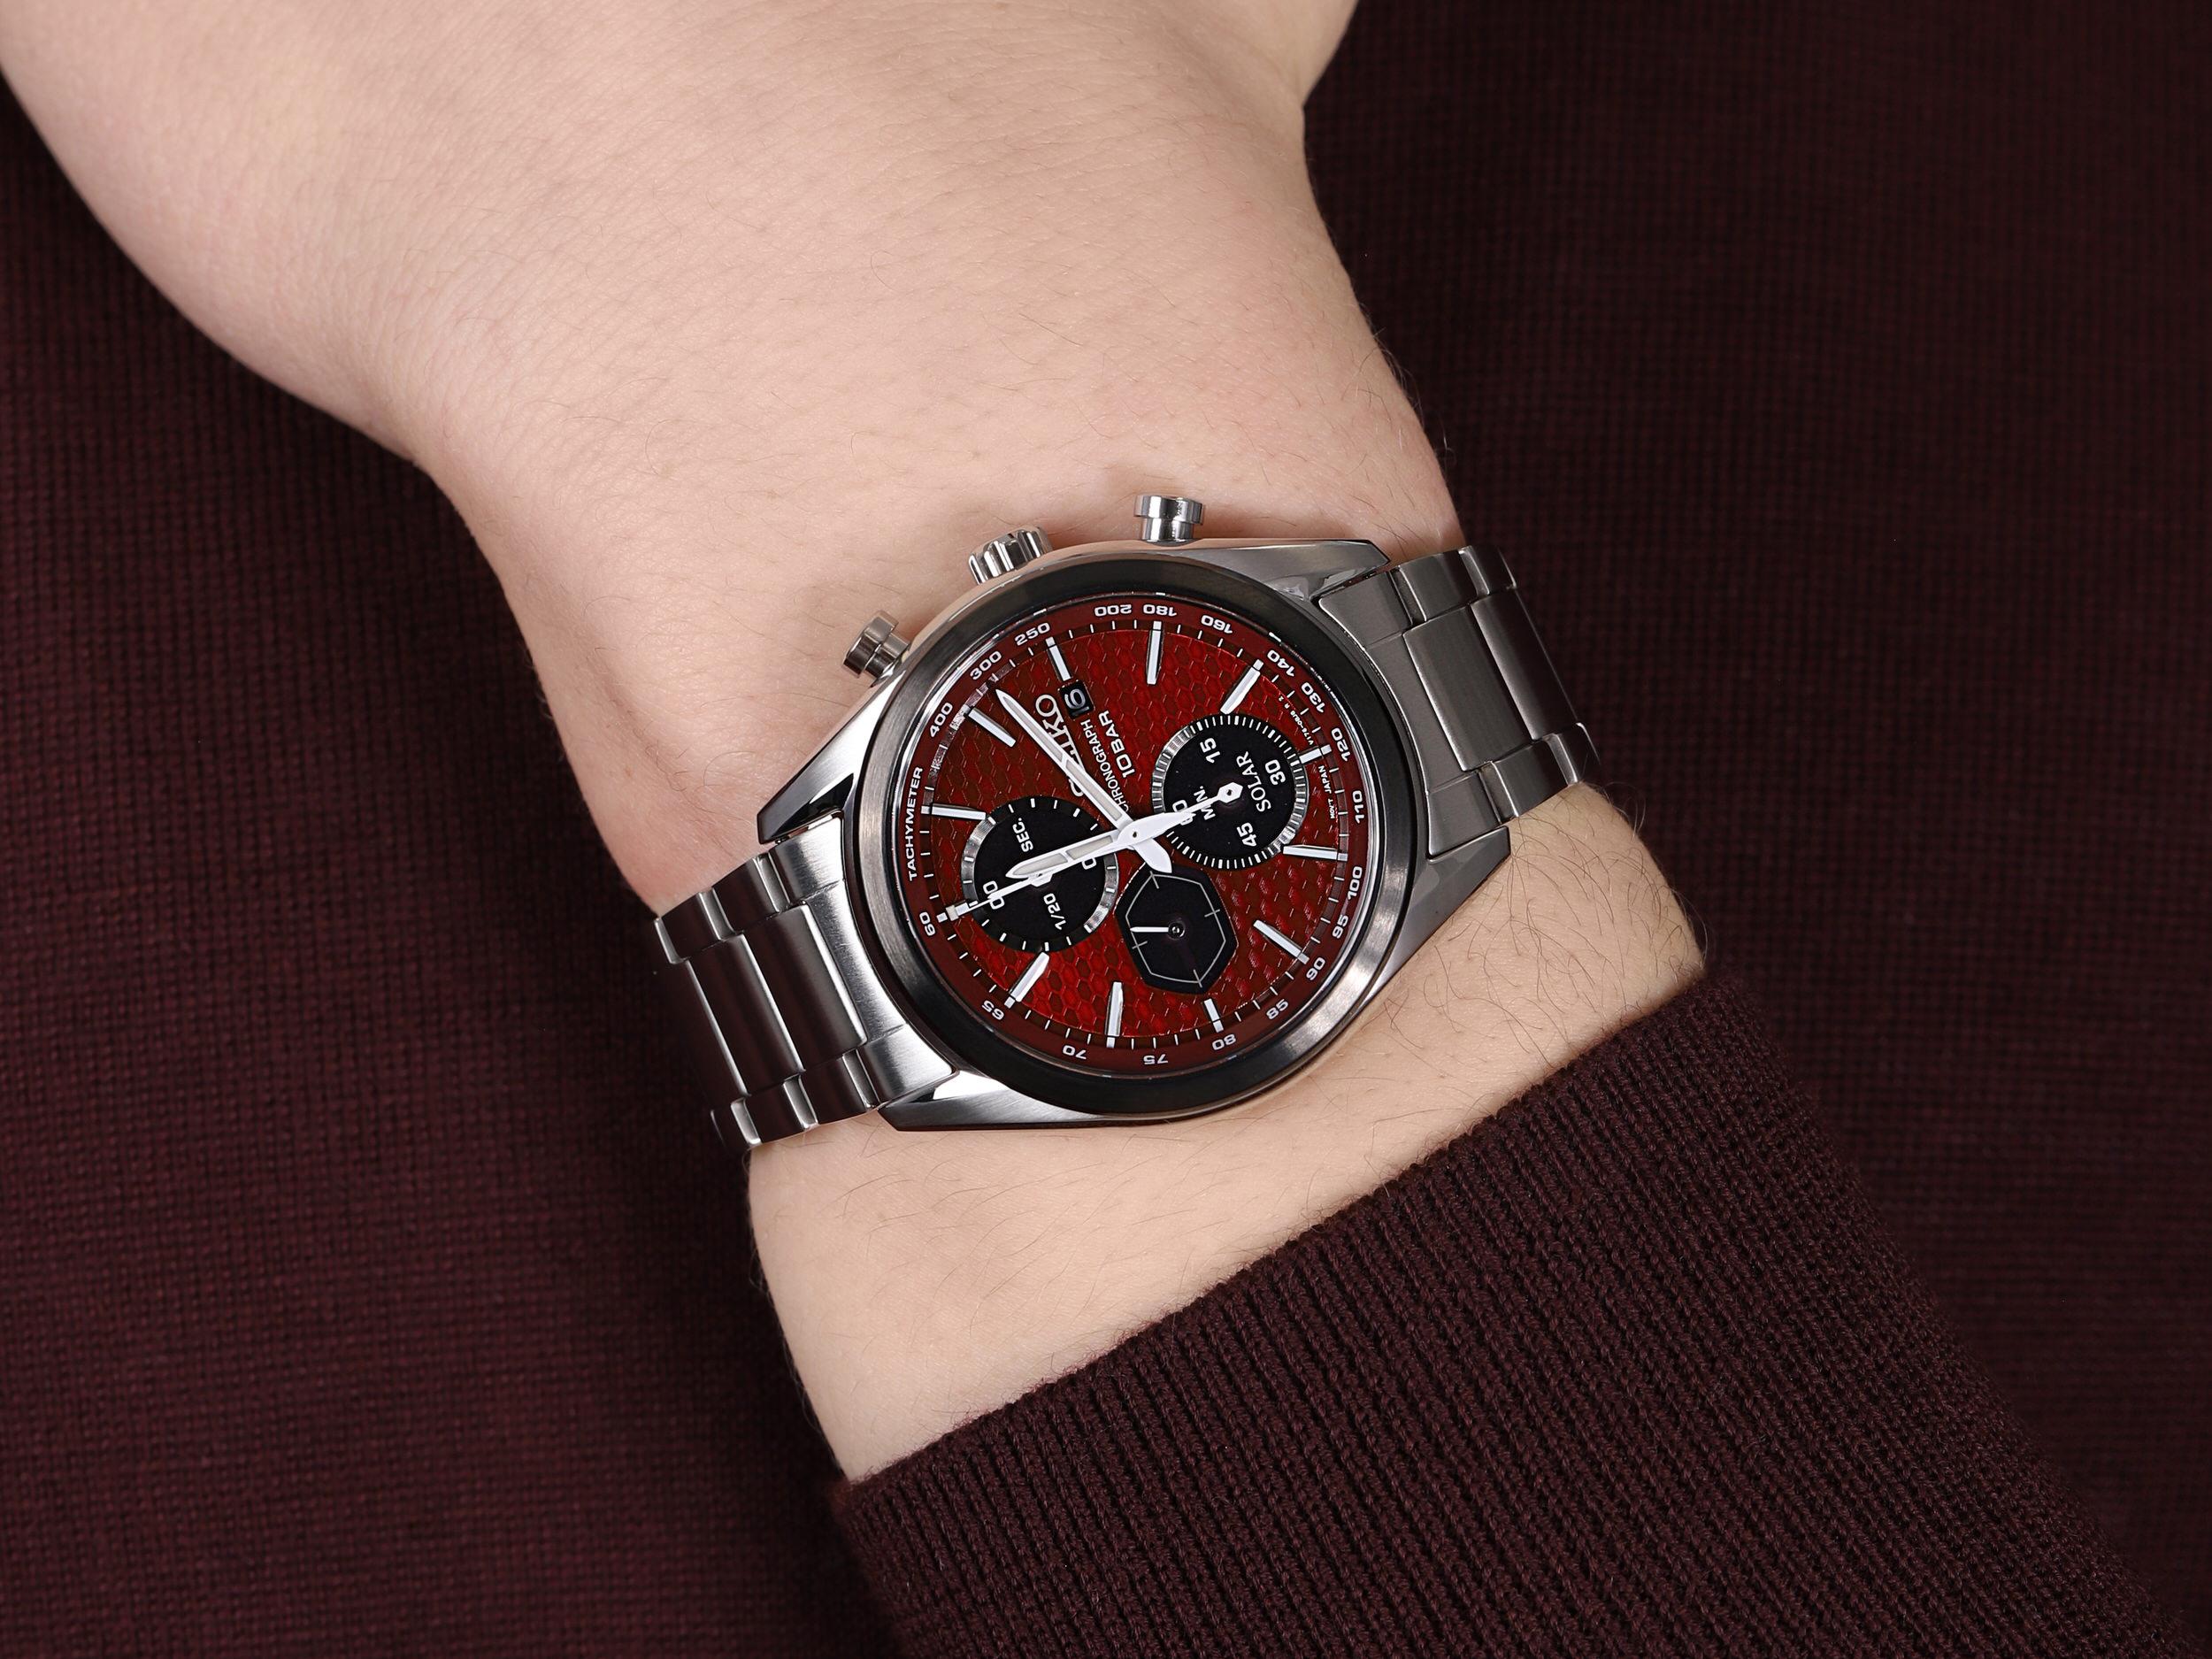 zegarek Seiko SSC771P1 męski z tachometr Chronograph